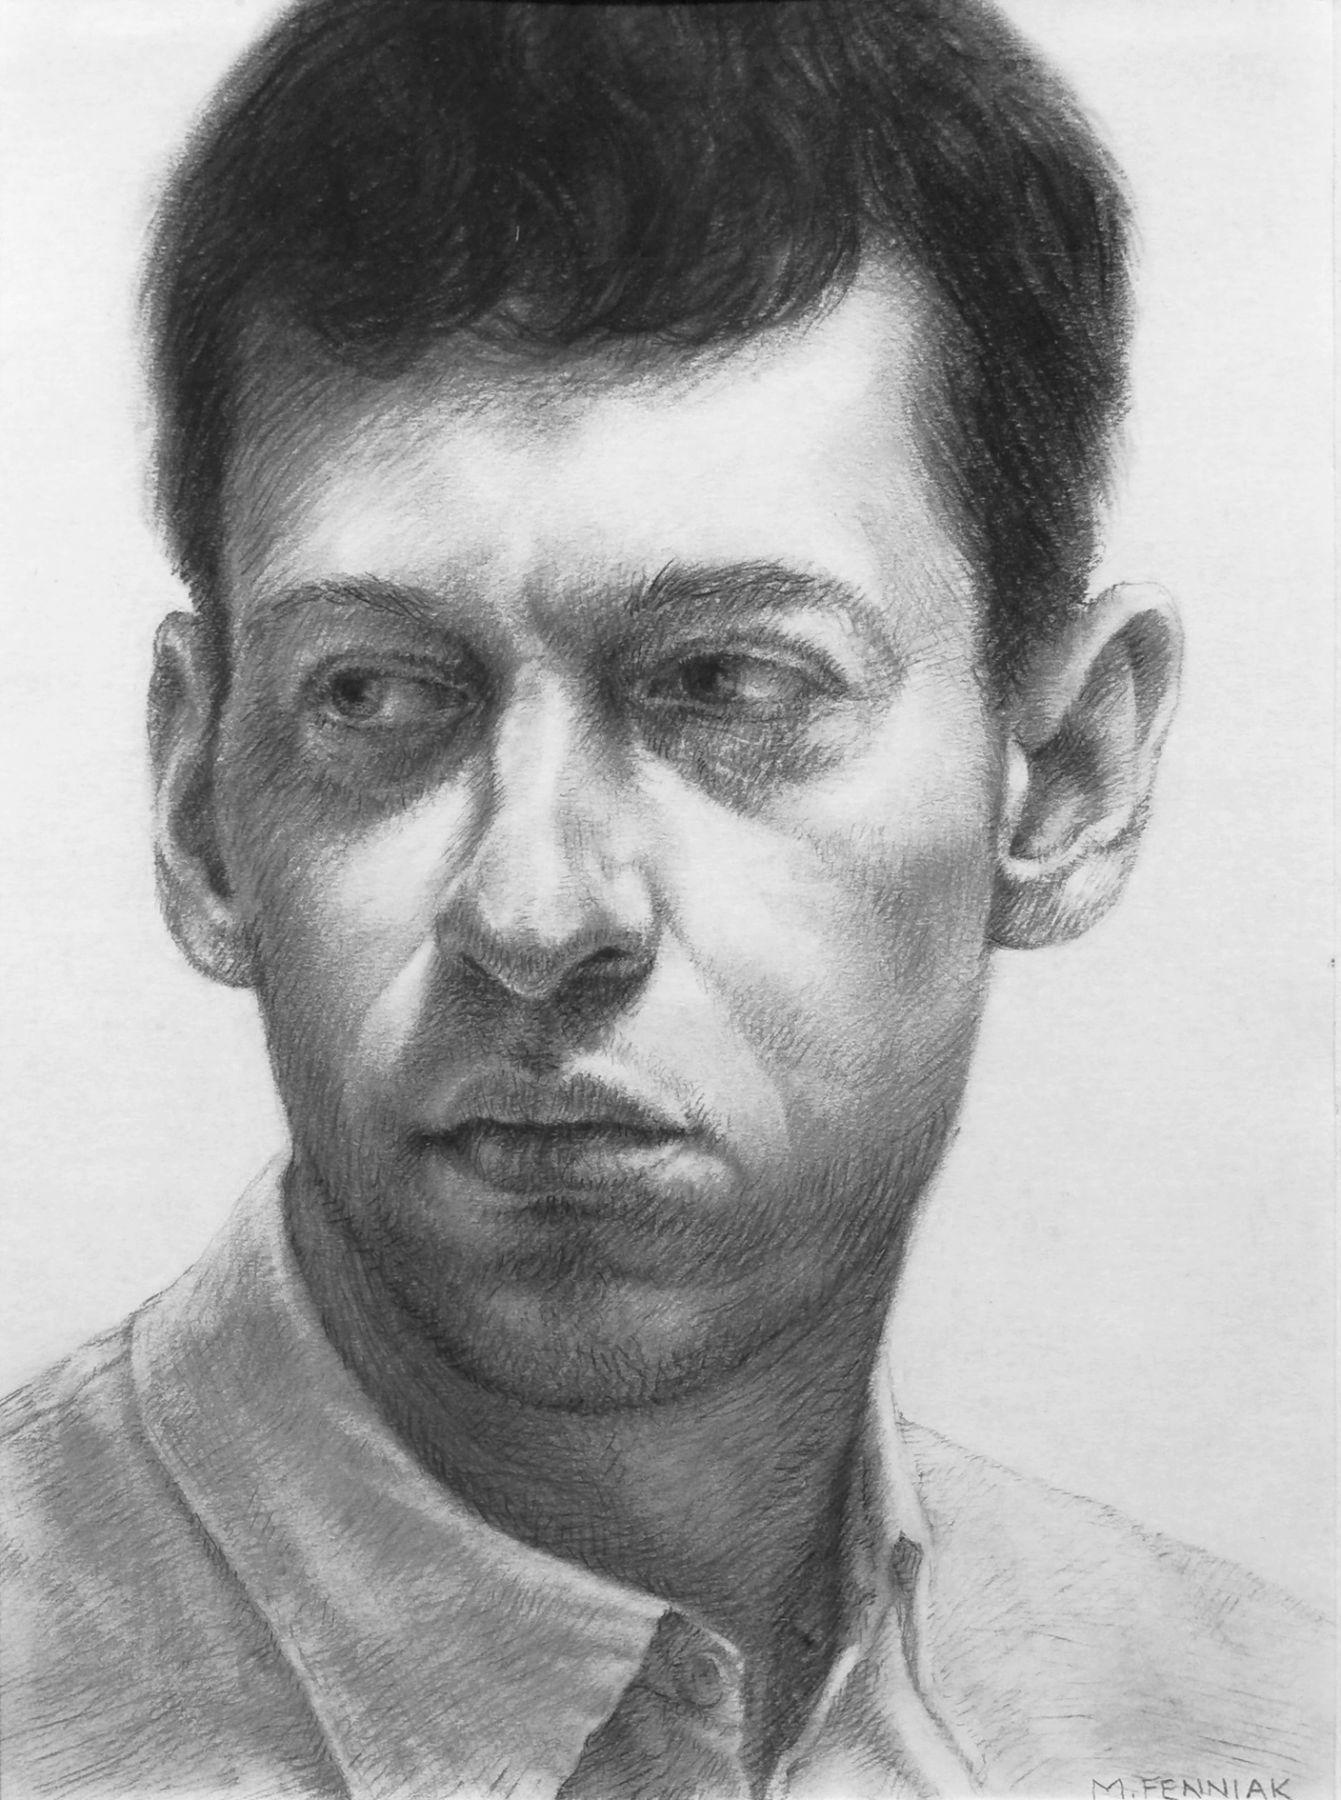 michelel fenniak, Daniel, 2002, charcoal on paper, 9 1/4 x 6 3/4 inches